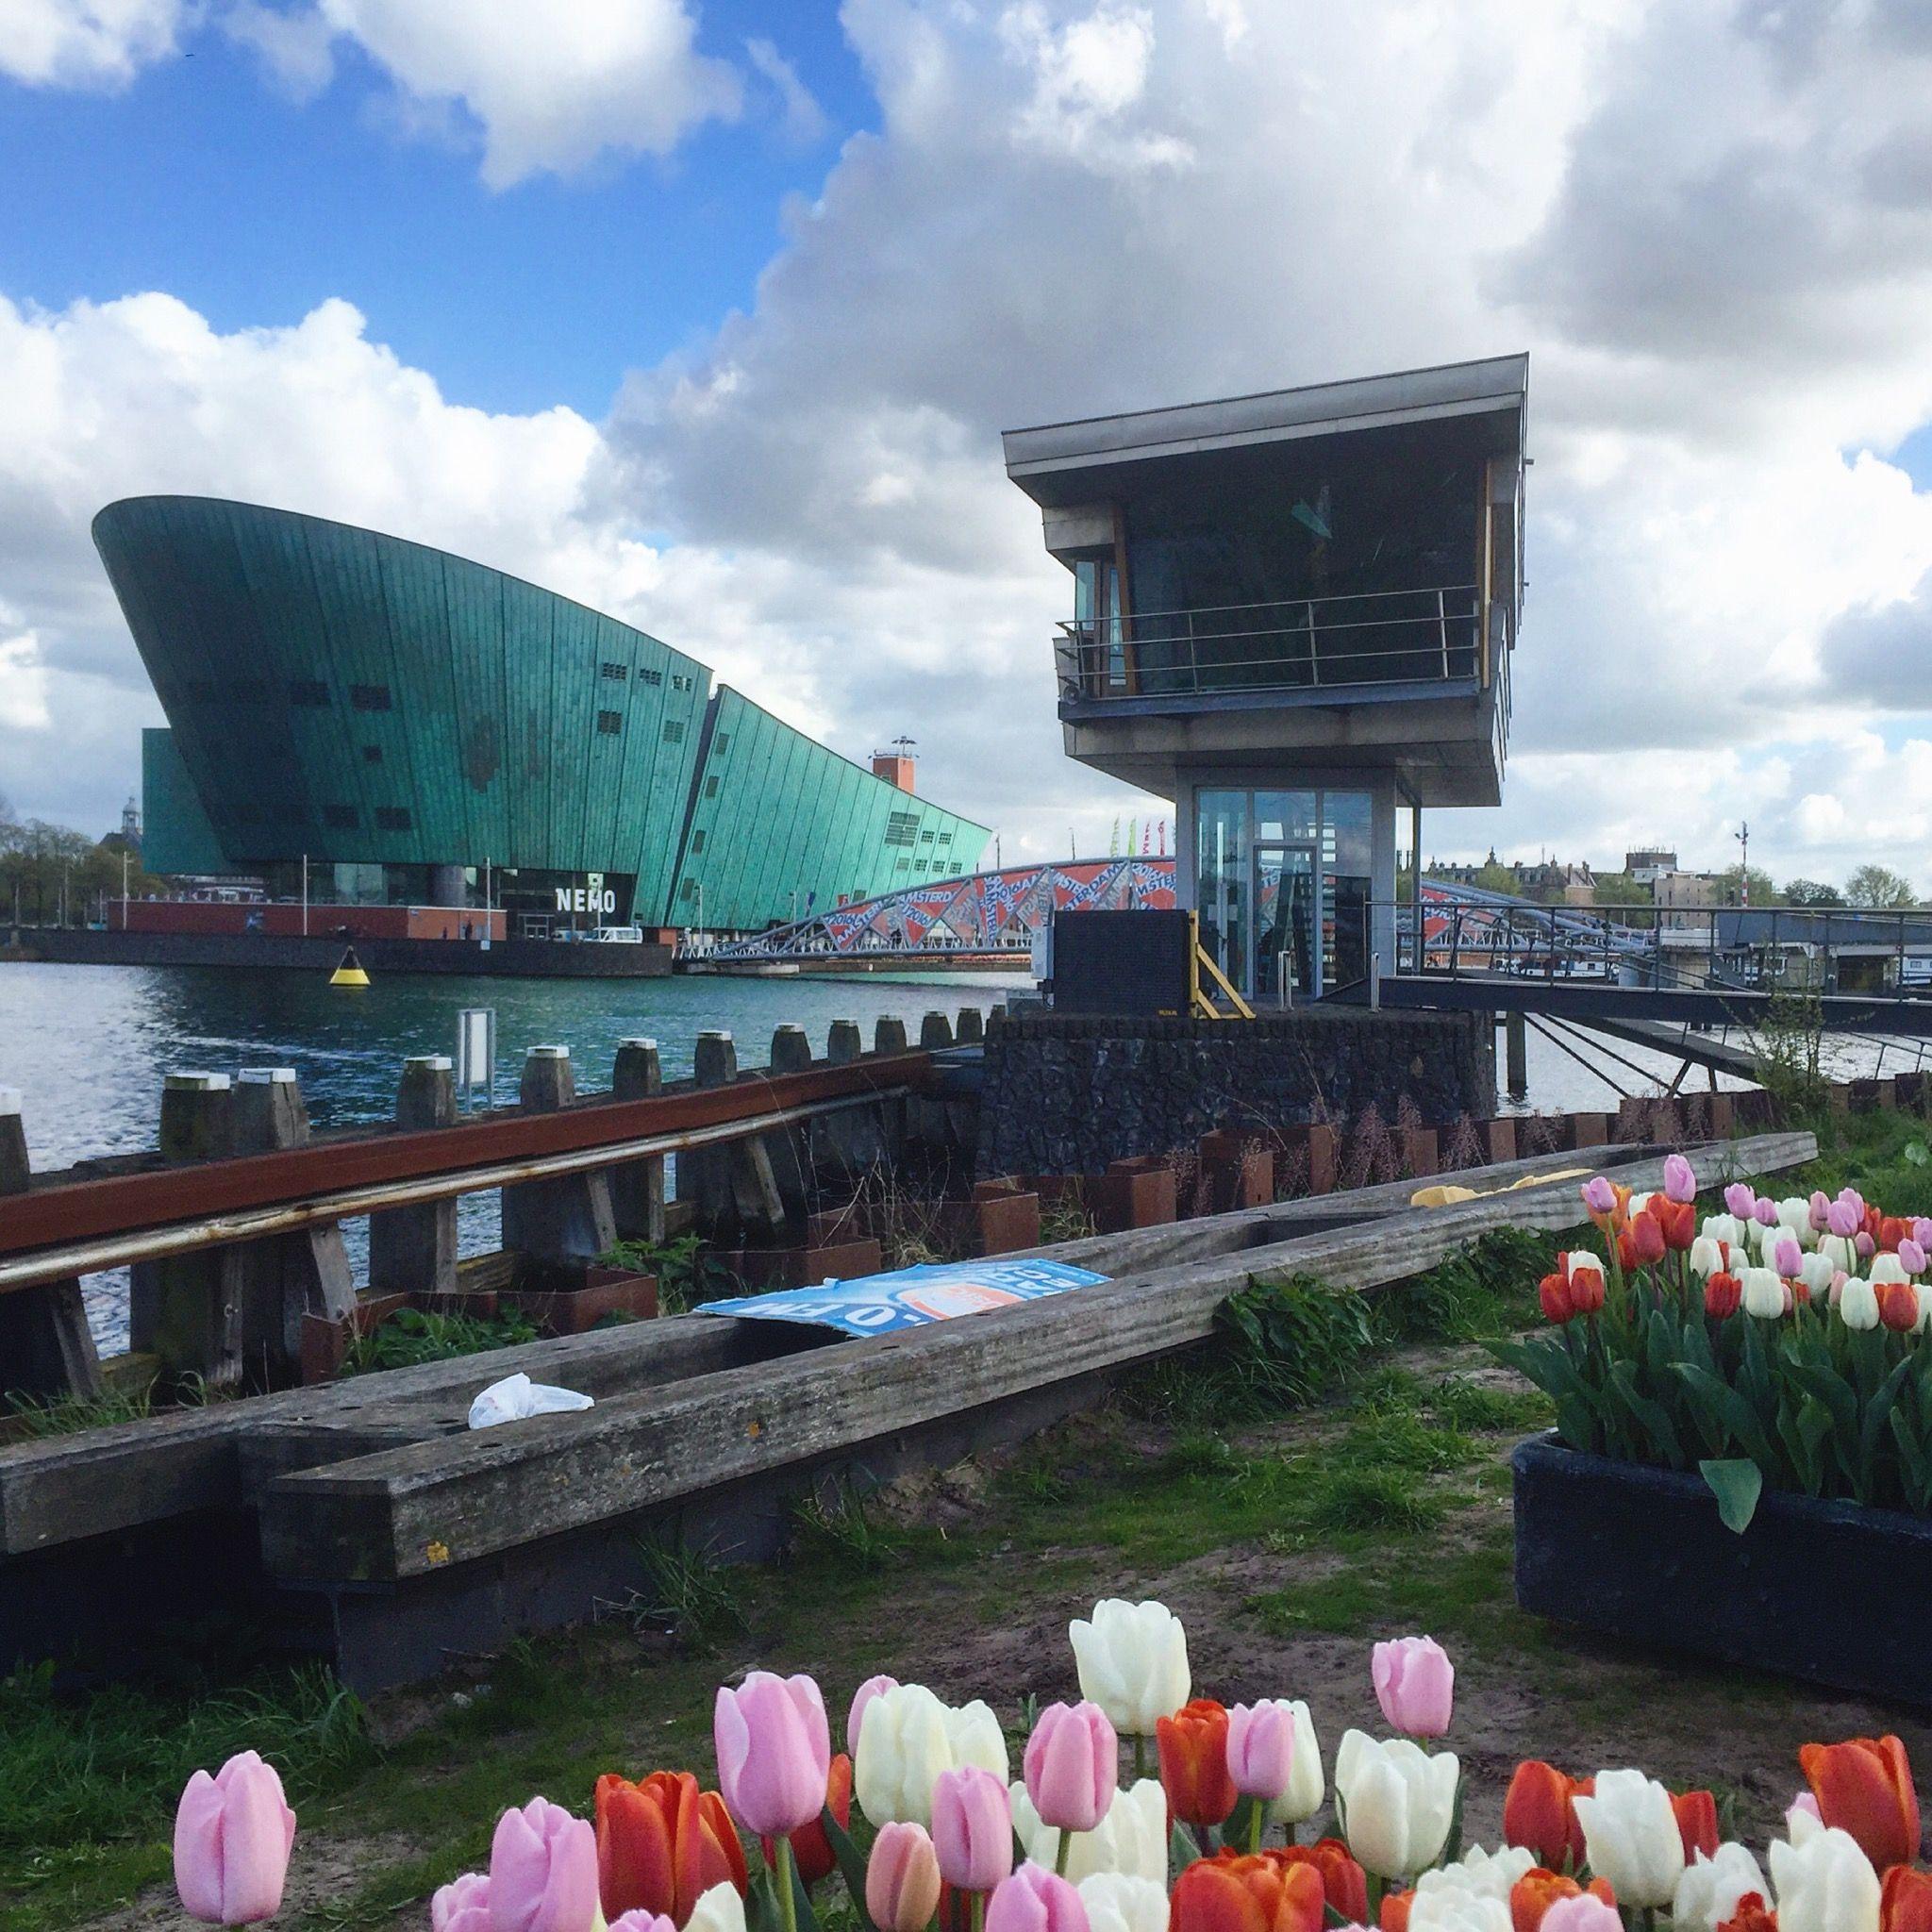 Amsterdam, Nemo